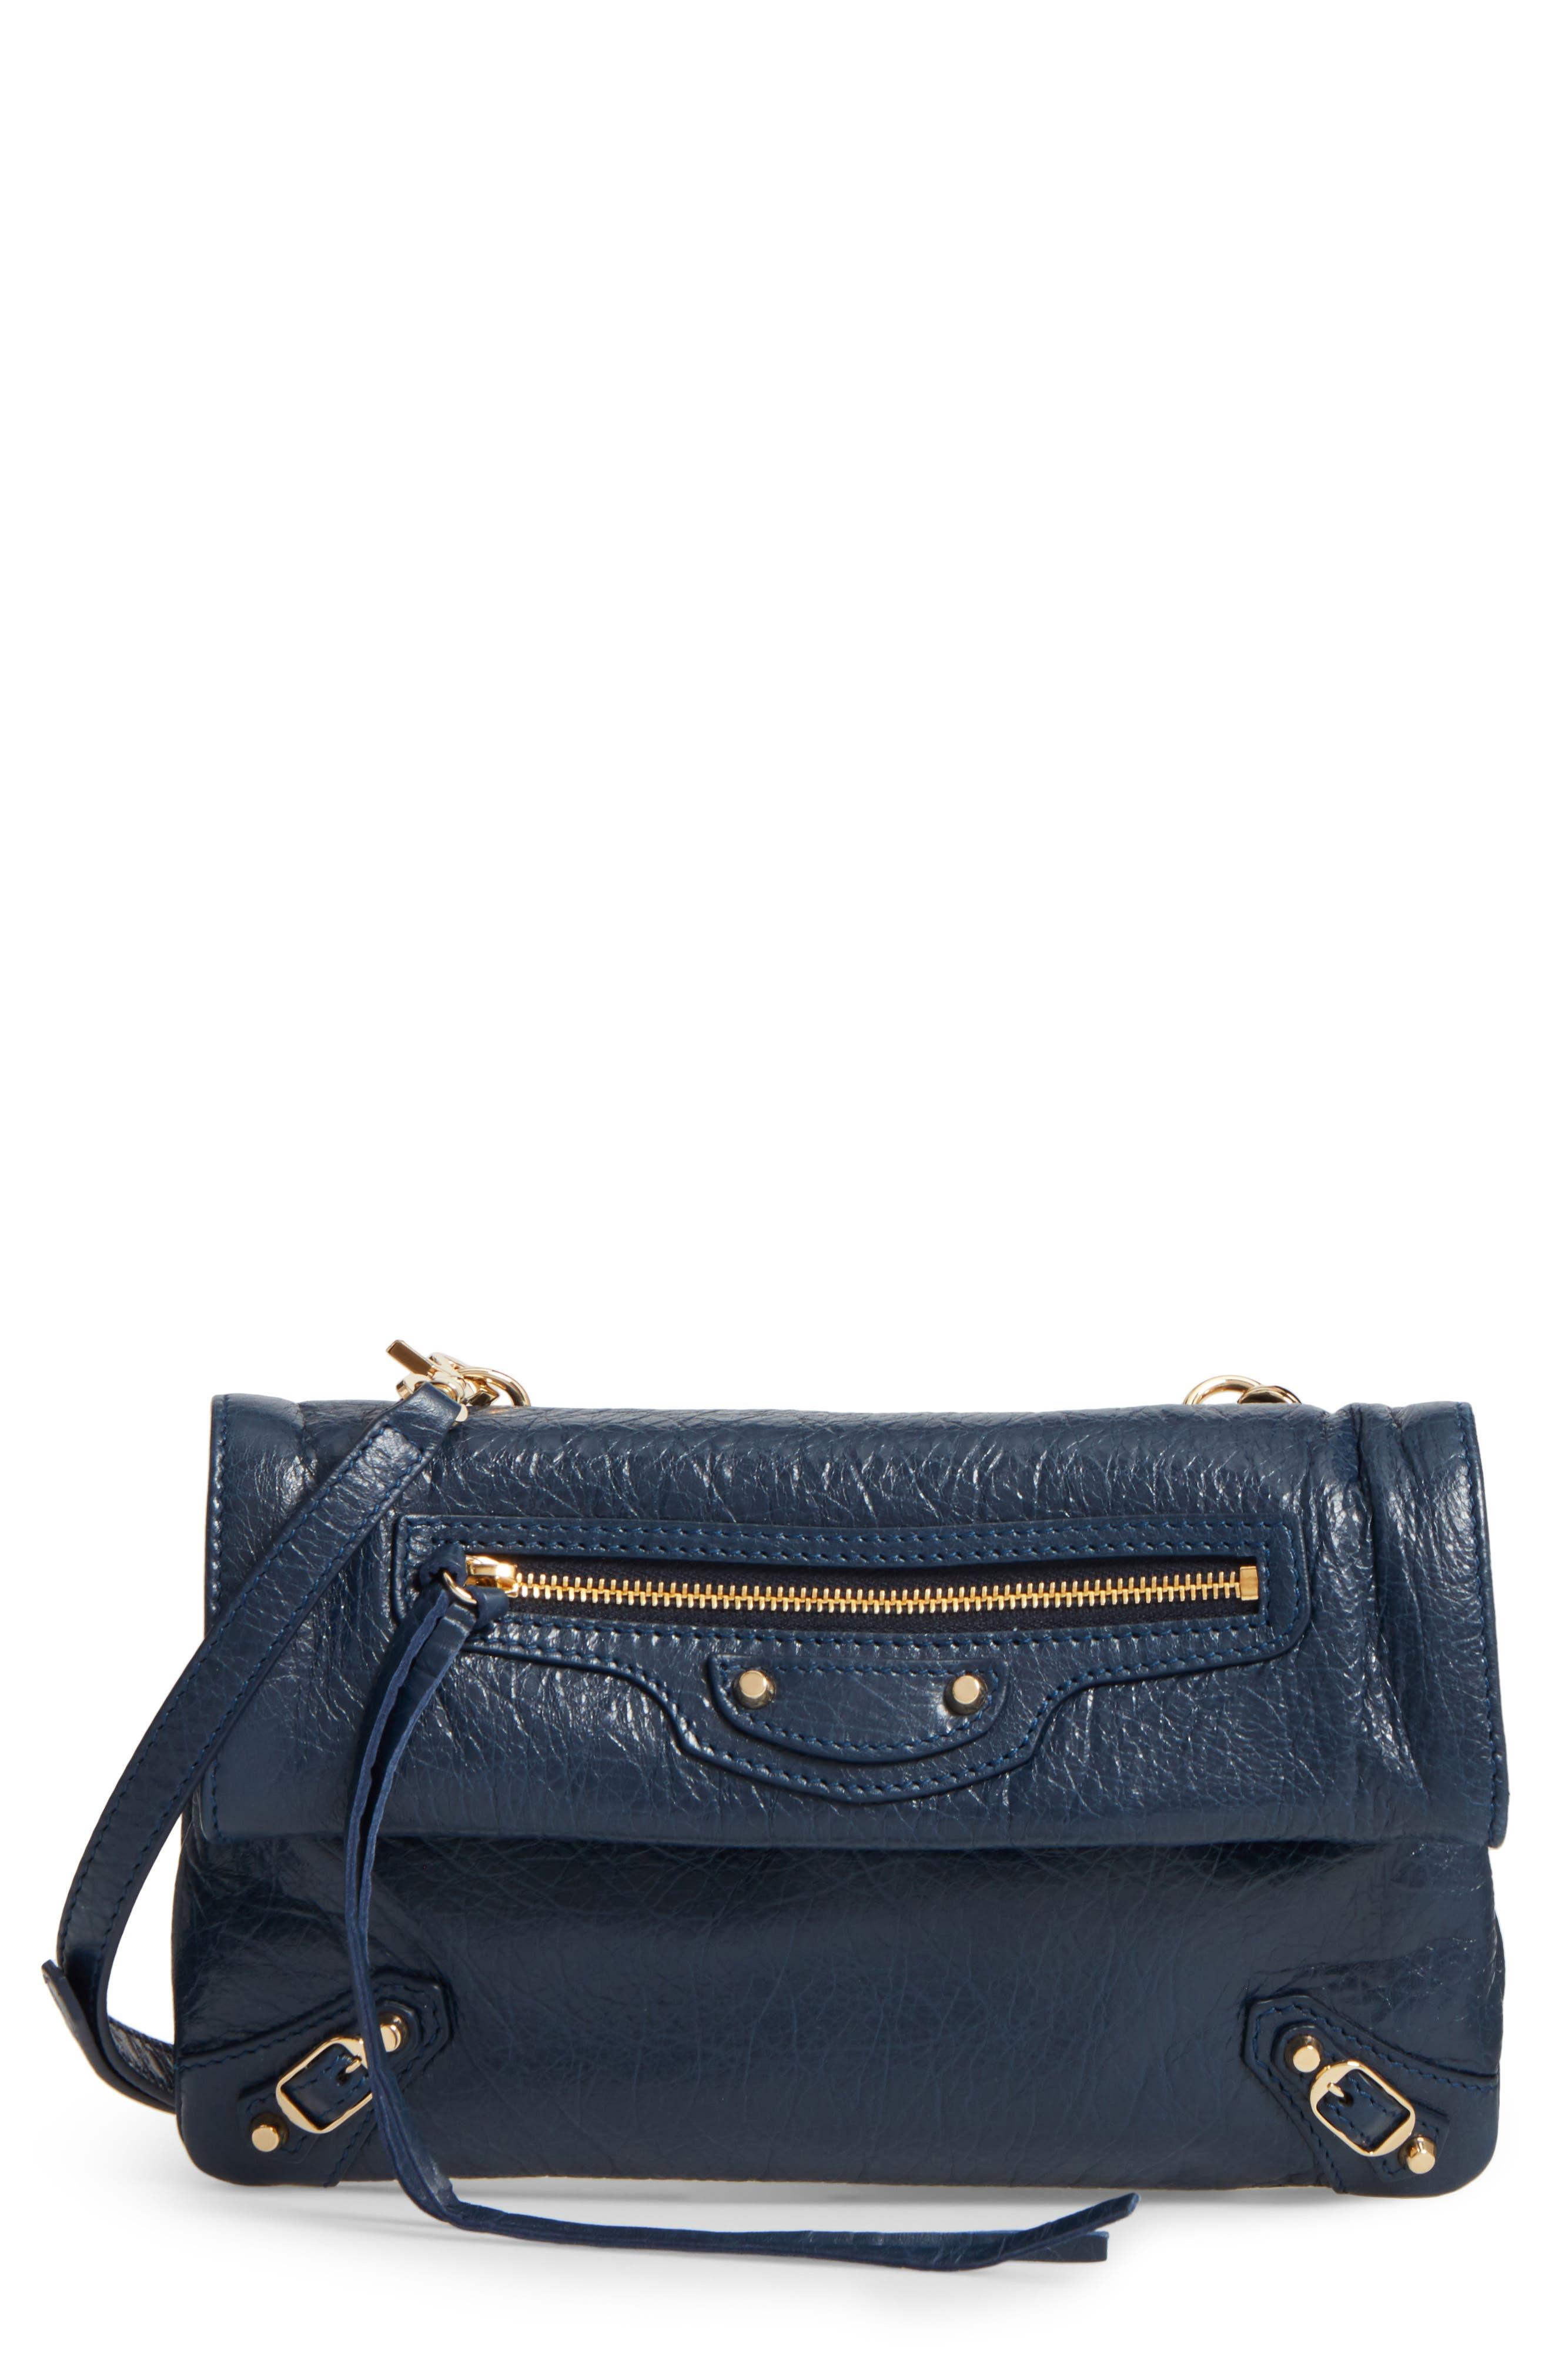 Balenciaga Classic Mini Envelope Leather Crossbody Bag